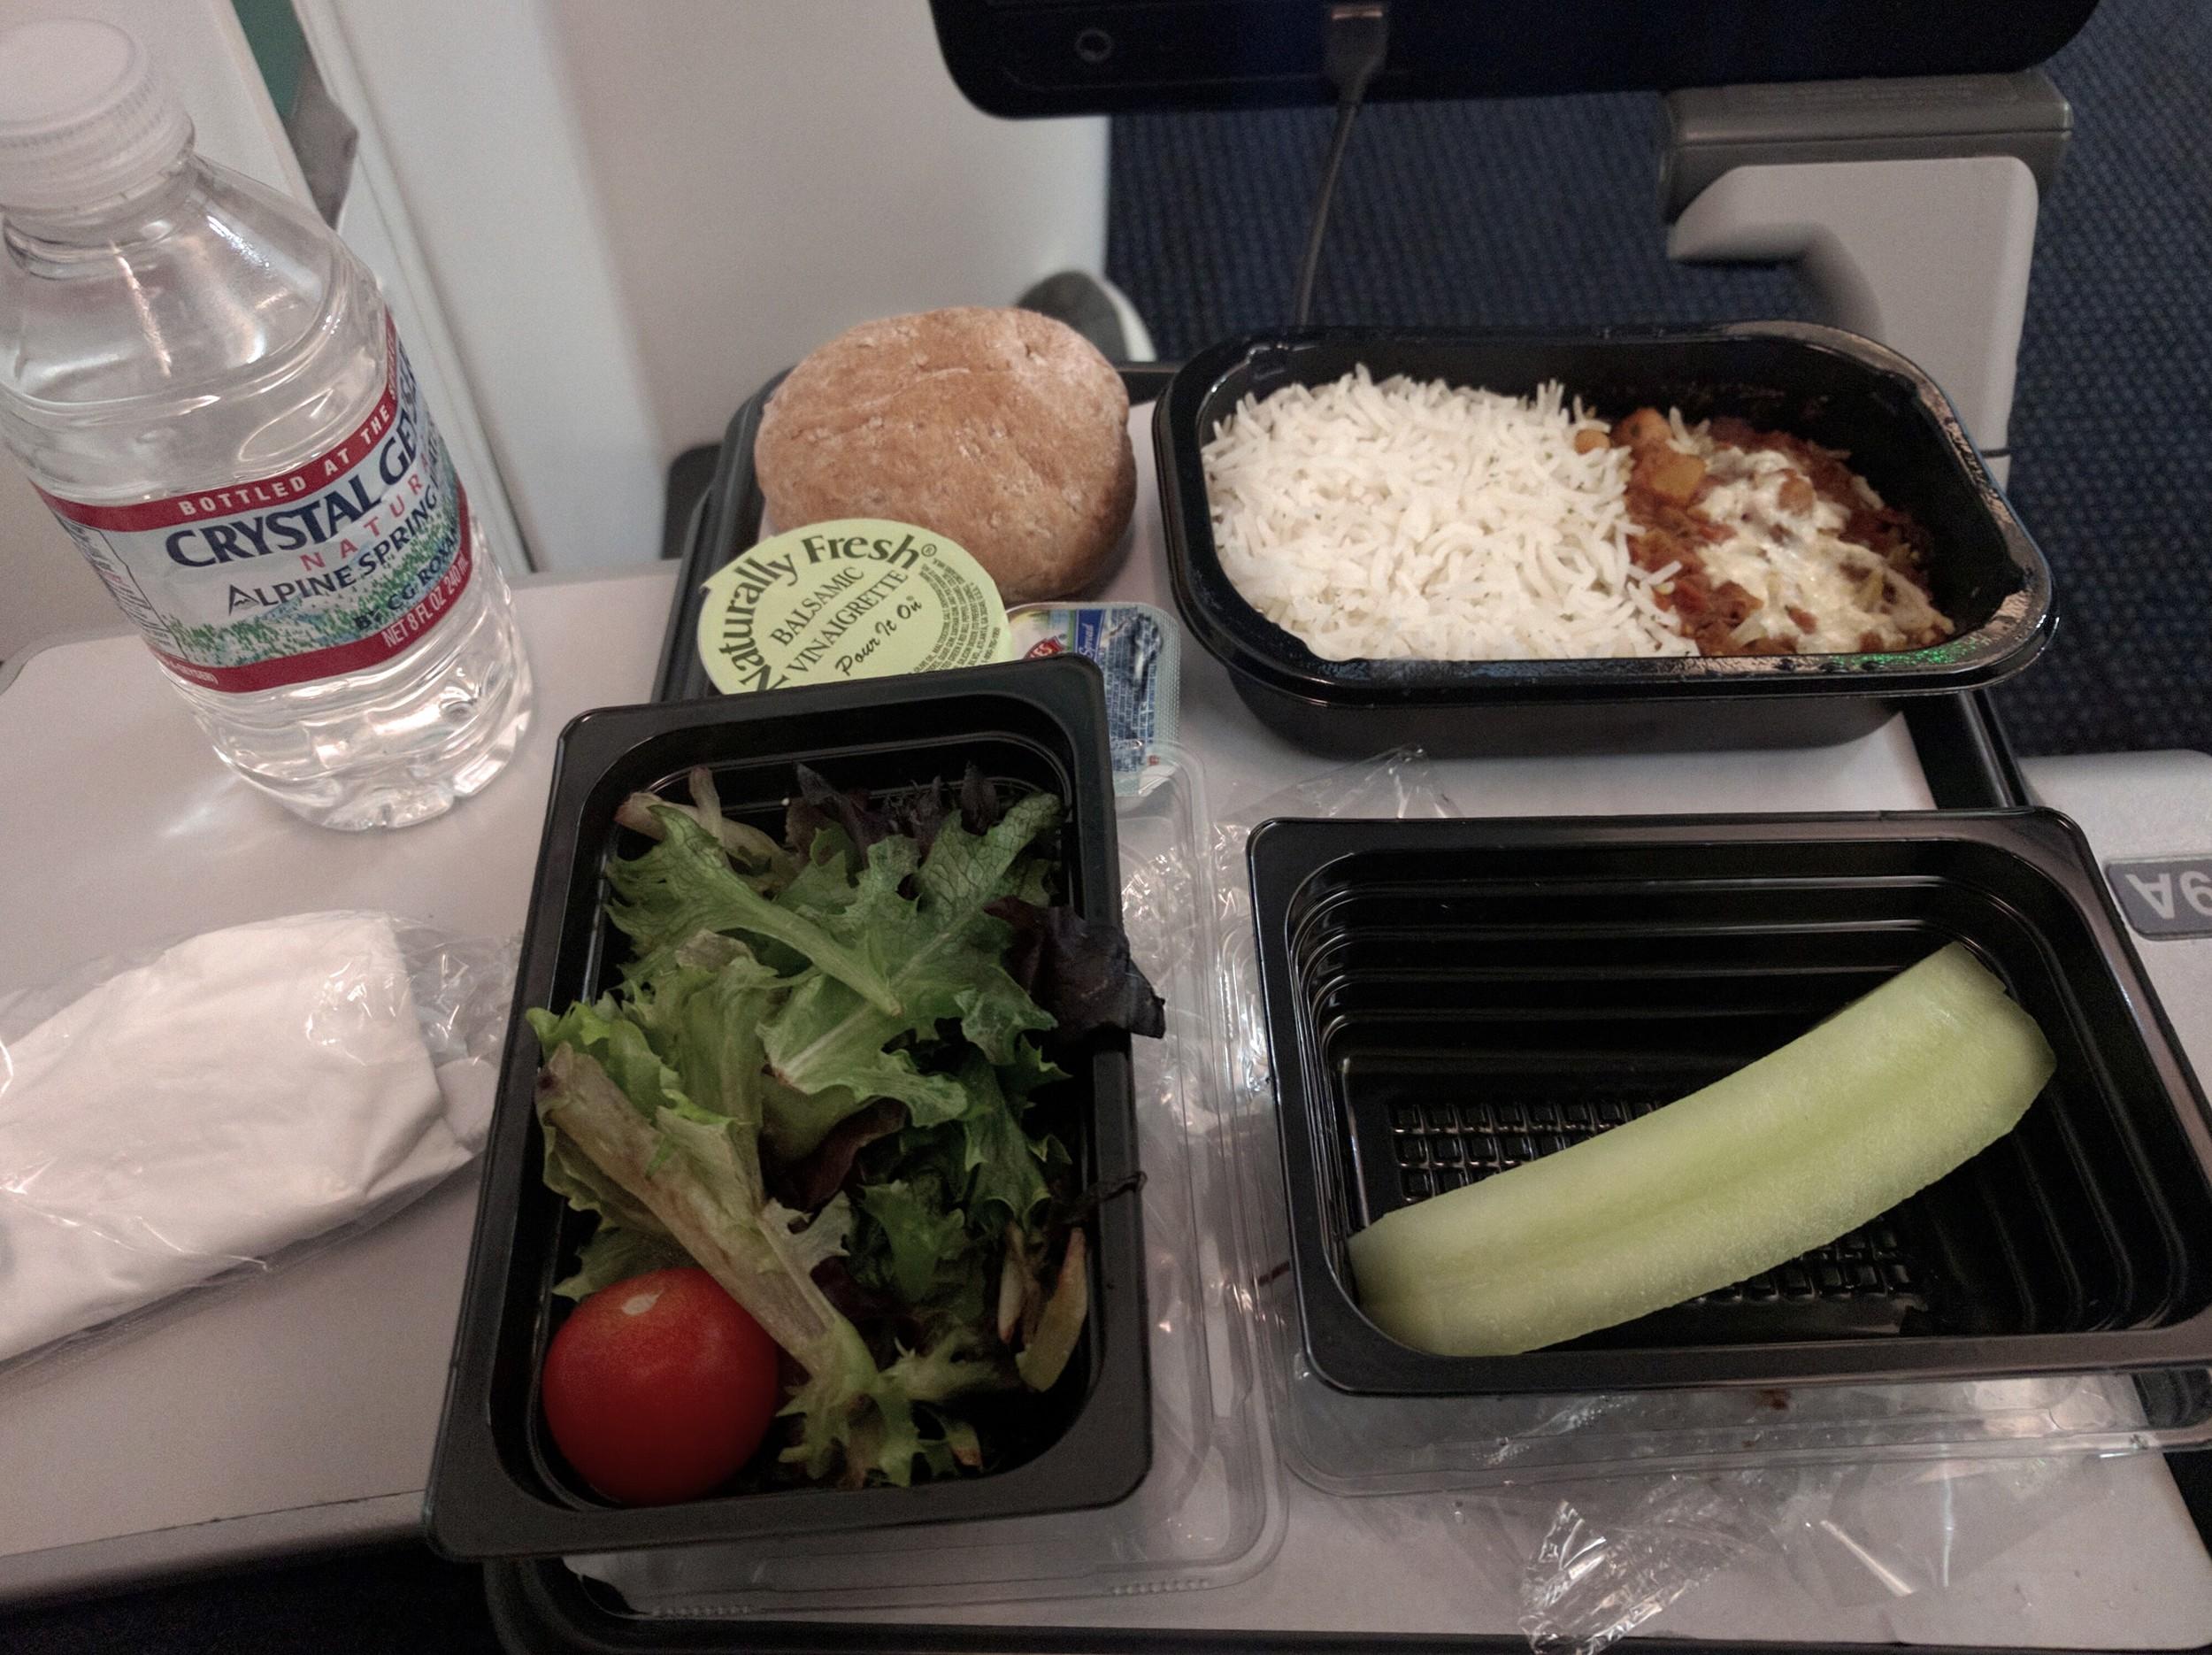 Vegetarian/Vegan Economy Meal